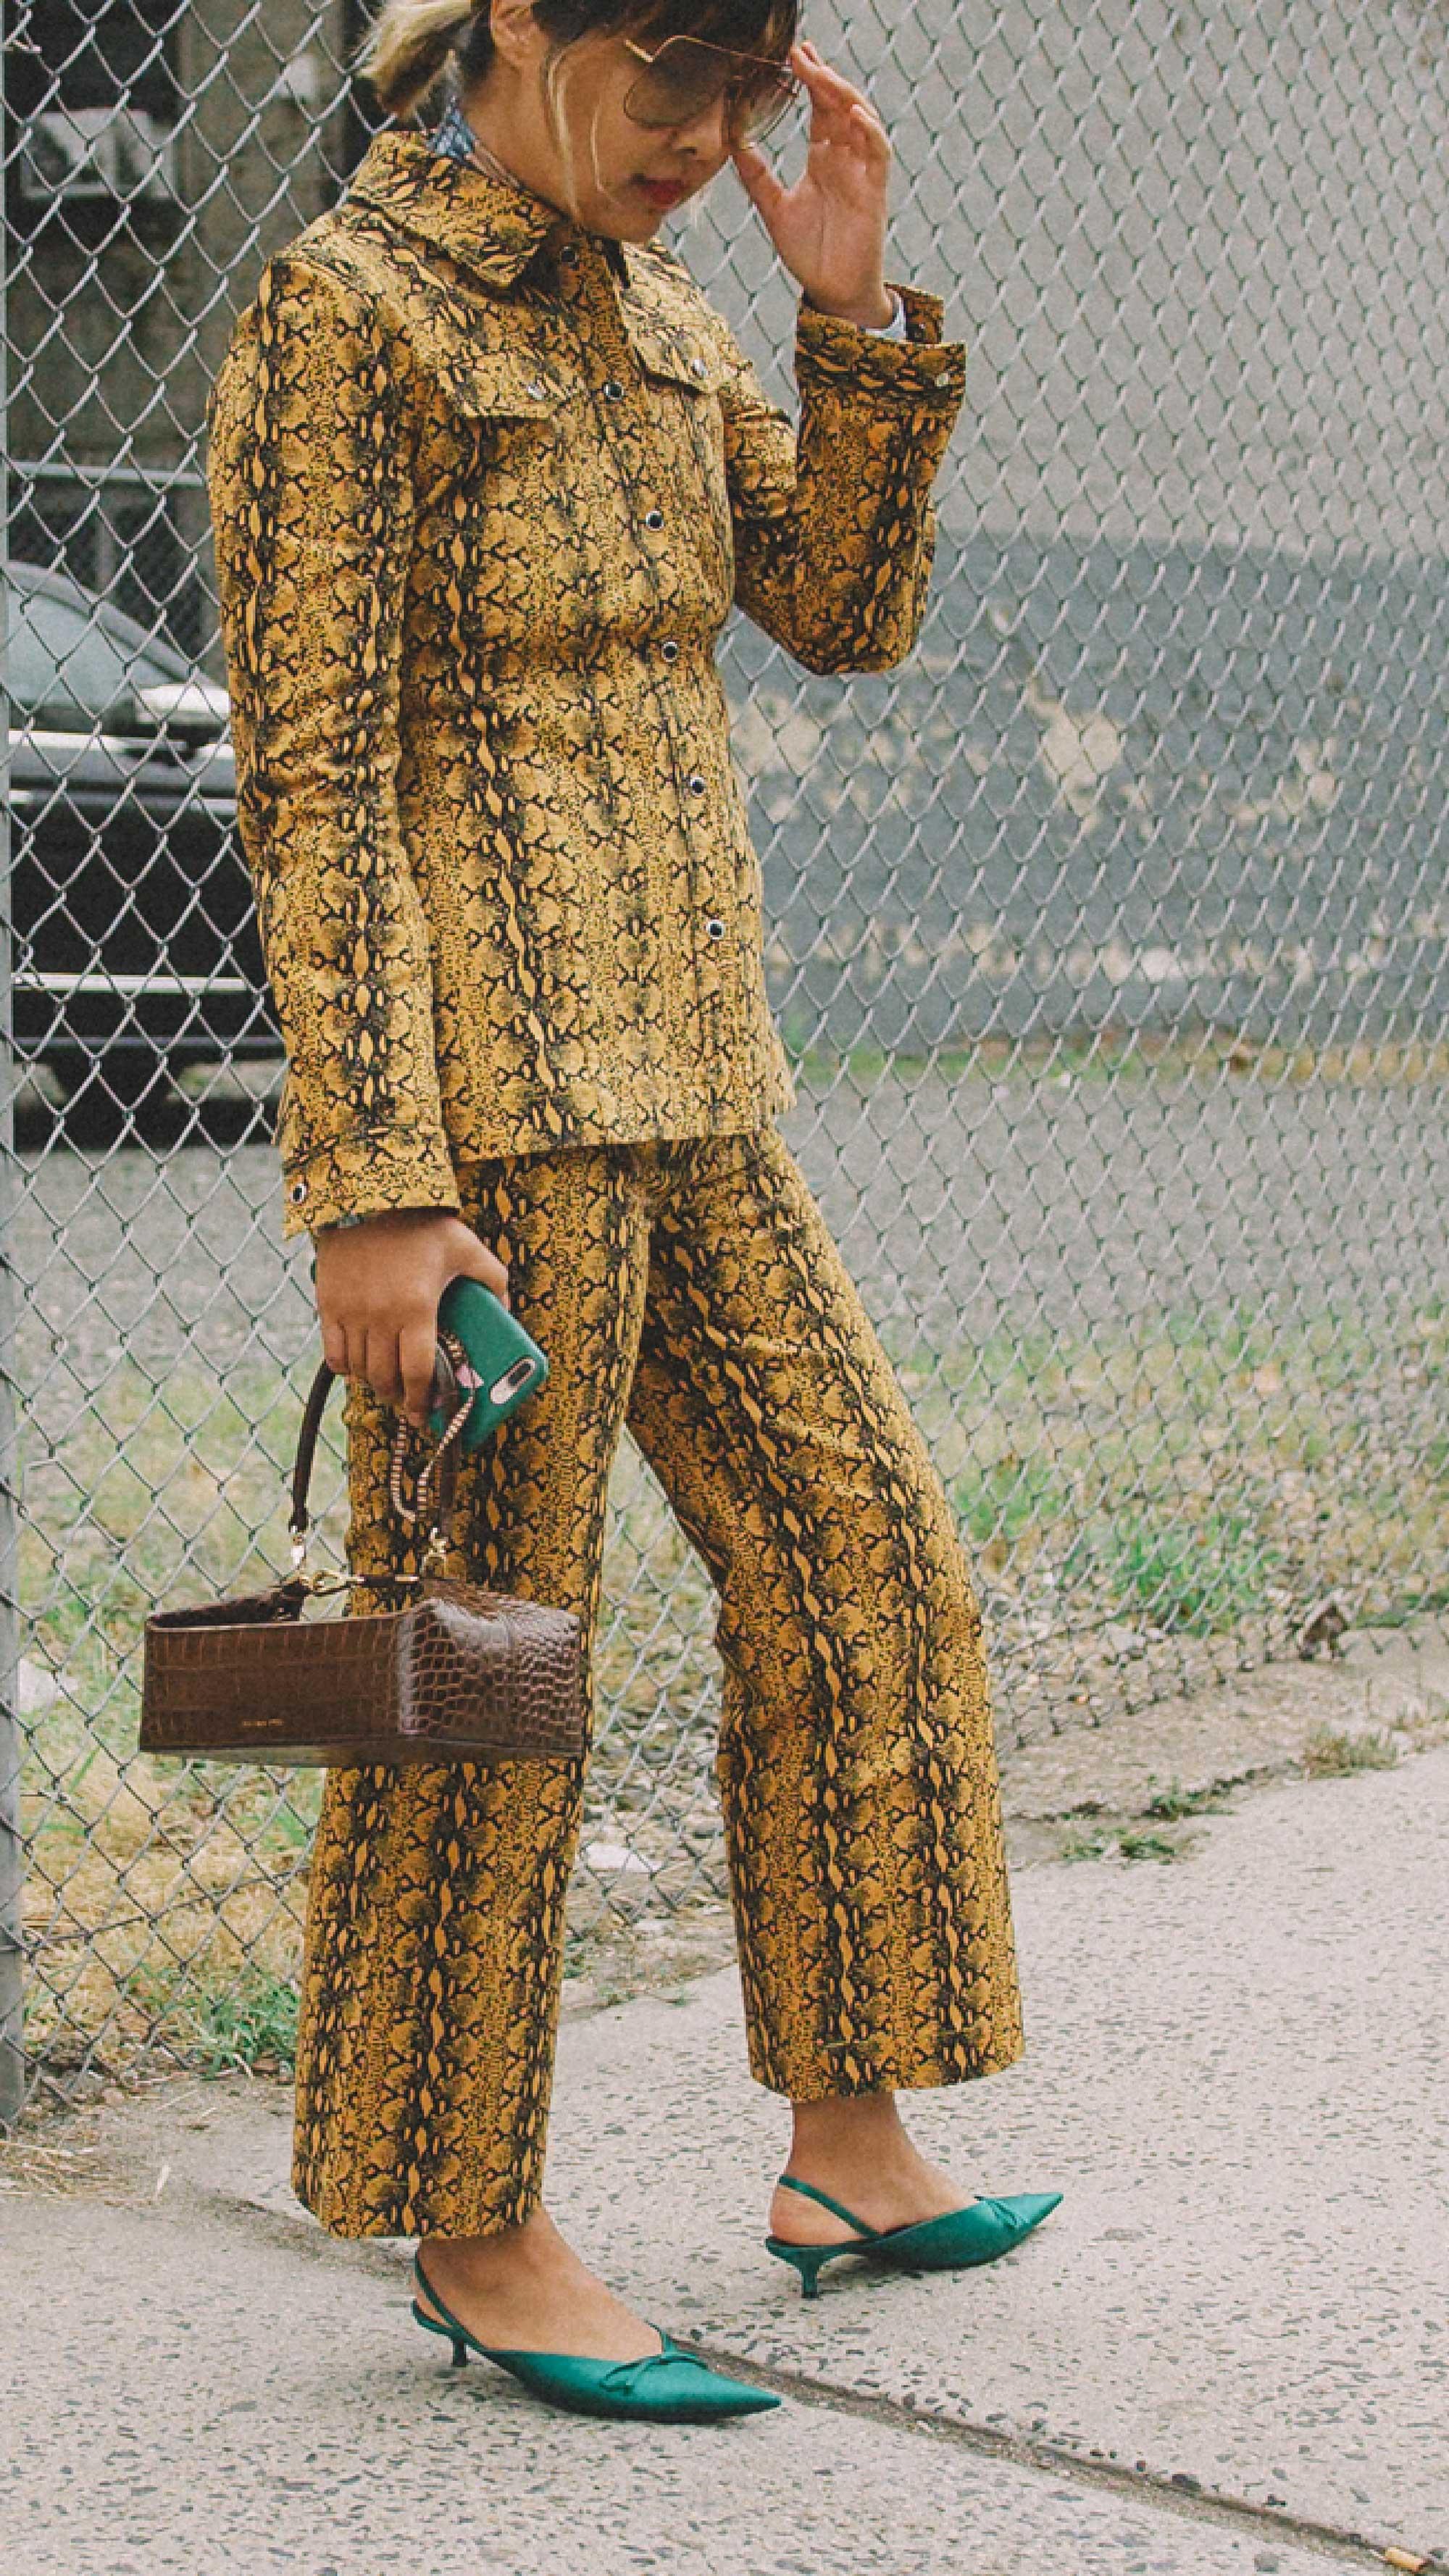 New-York-Fashion-Week-NYFW-SS18-street-style-day-three-SS1813.jpg